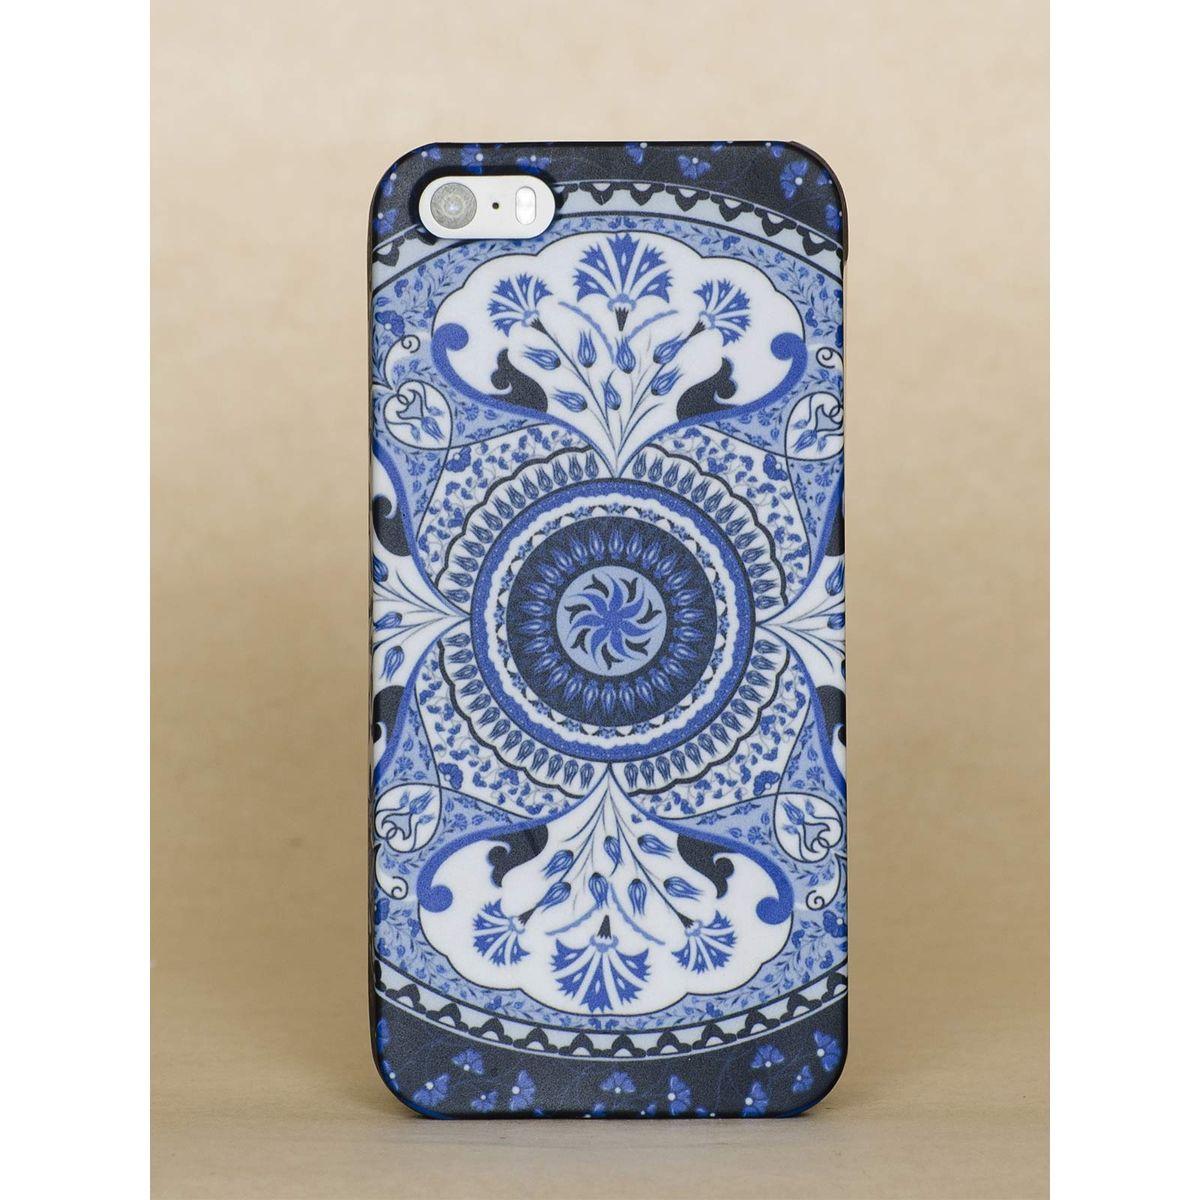 Blue Kaleidoscope Iphone 5S case